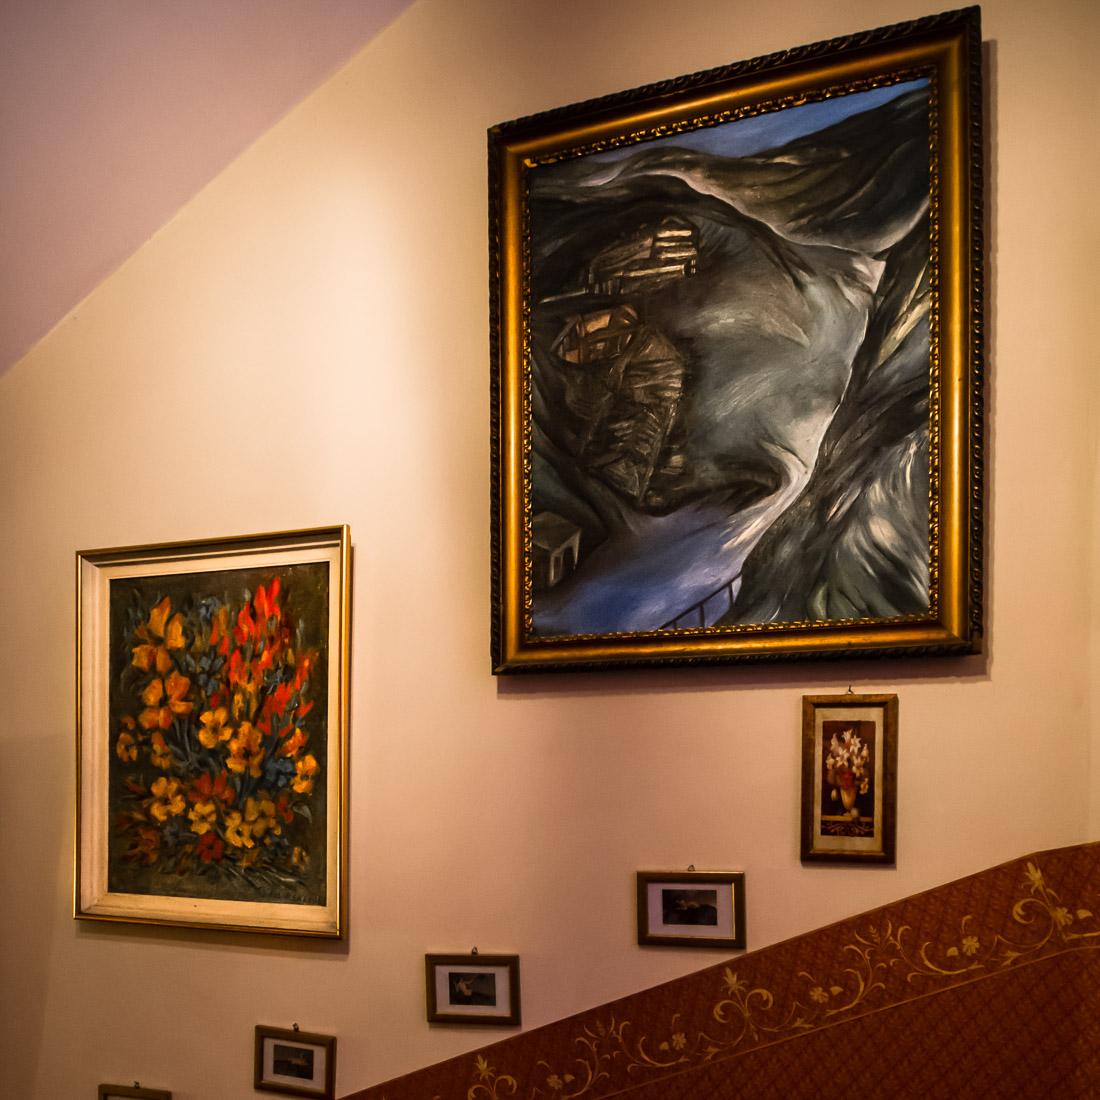 Galeria sztuki w klatce zamknieta 03